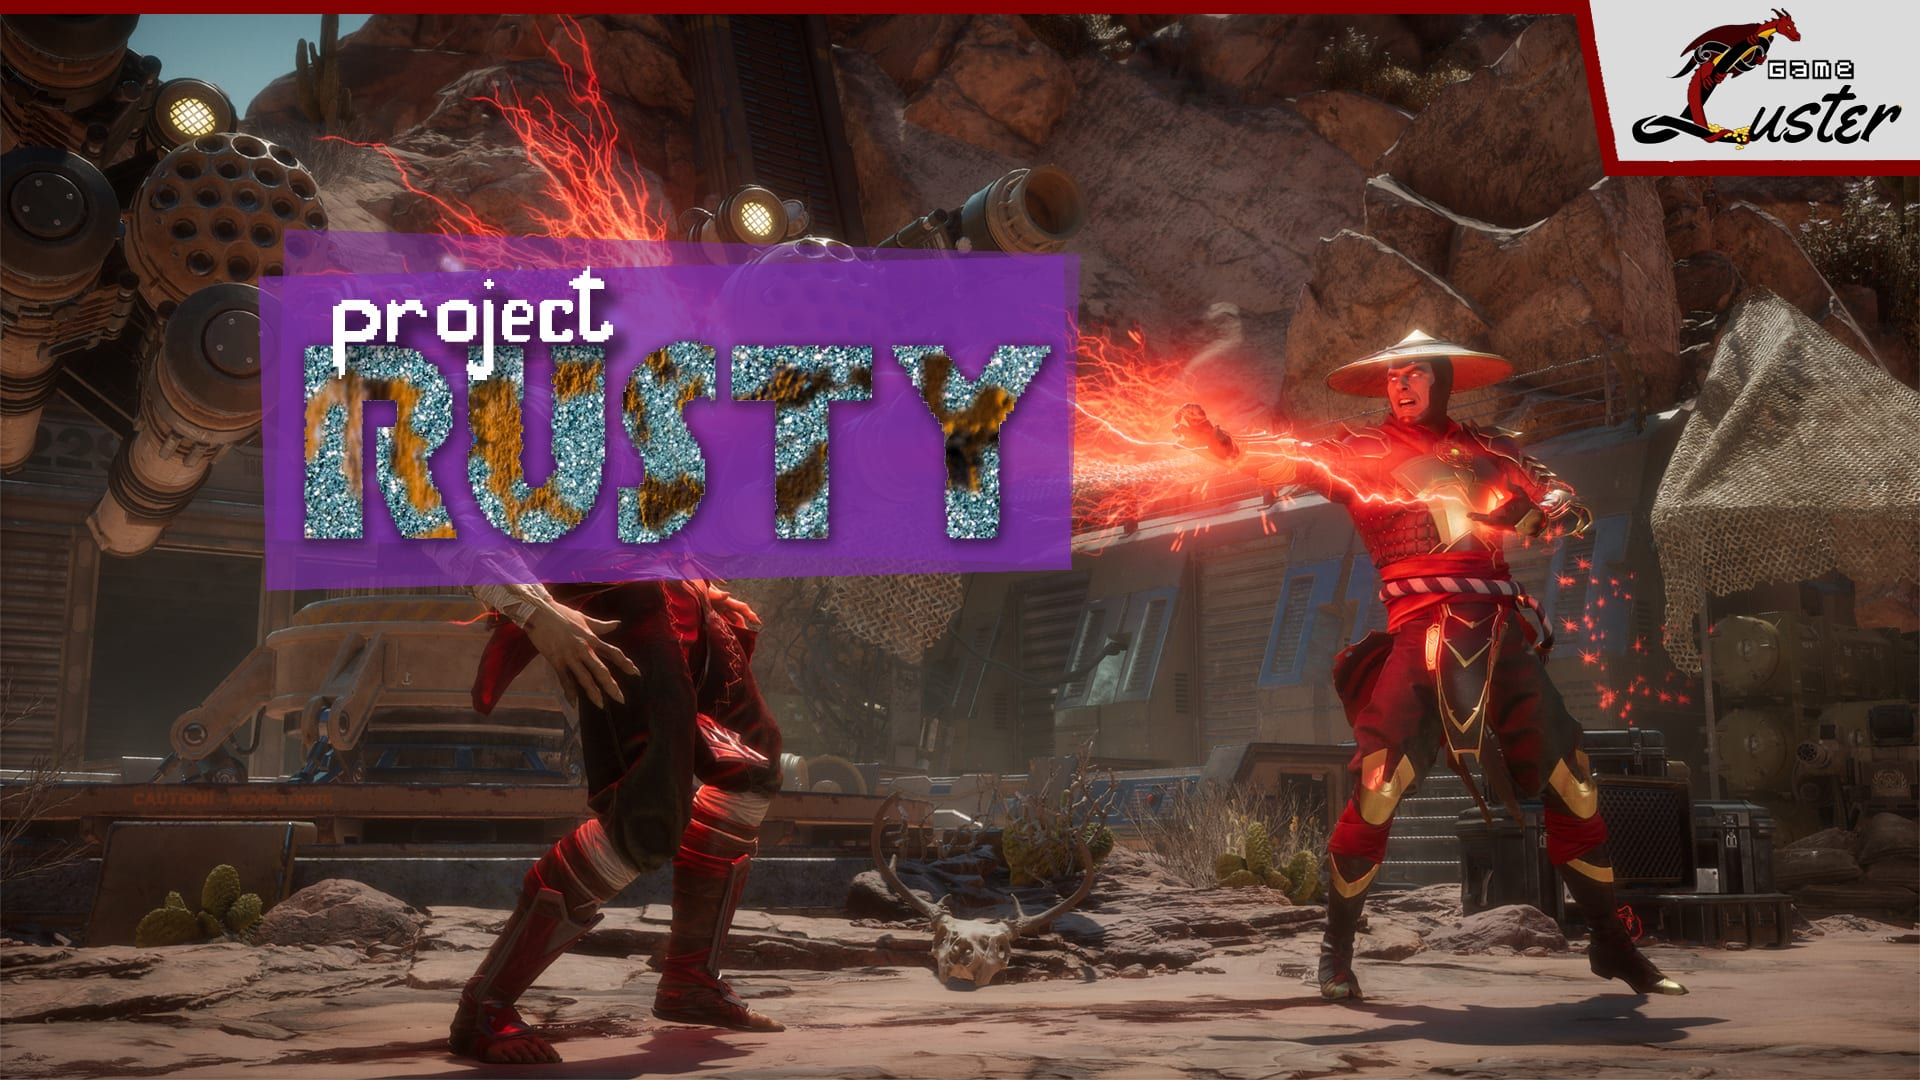 Project Rusty Mortal Kombat 11